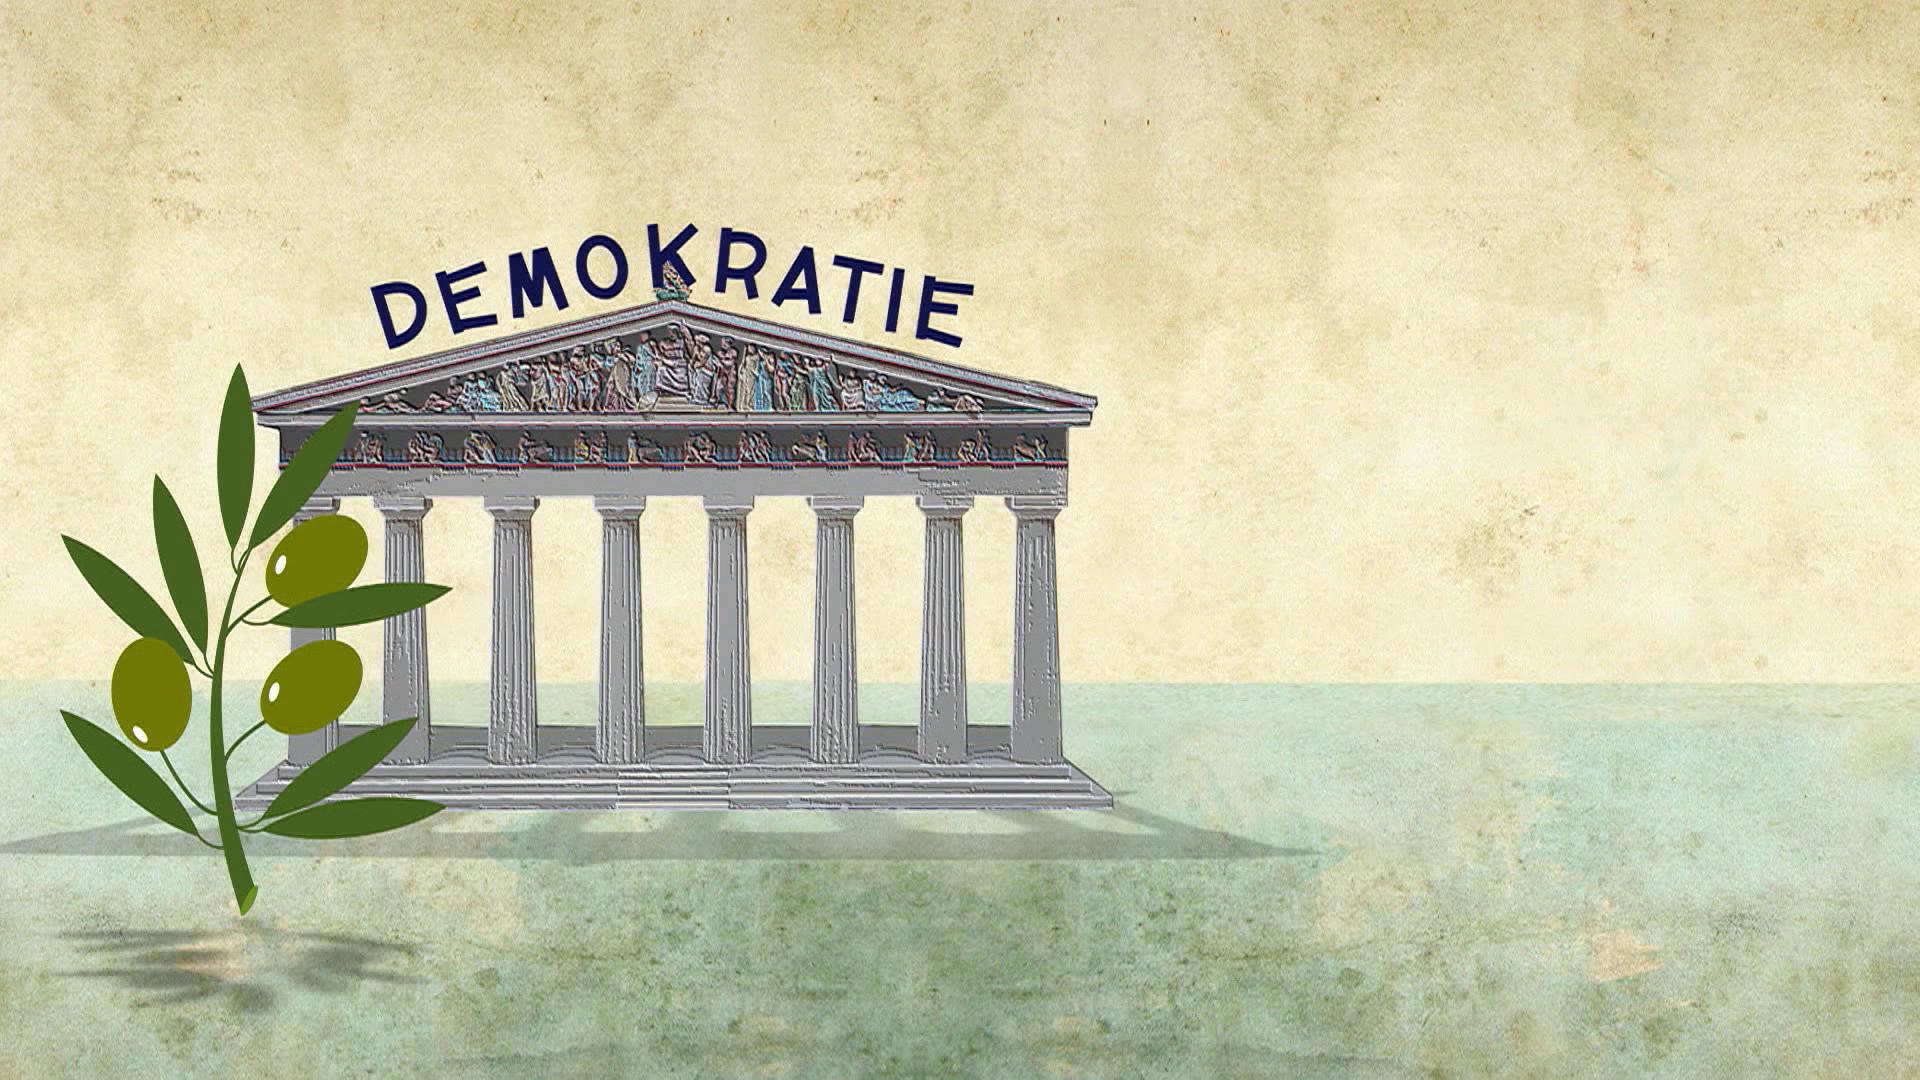 Die Erste Demokratie